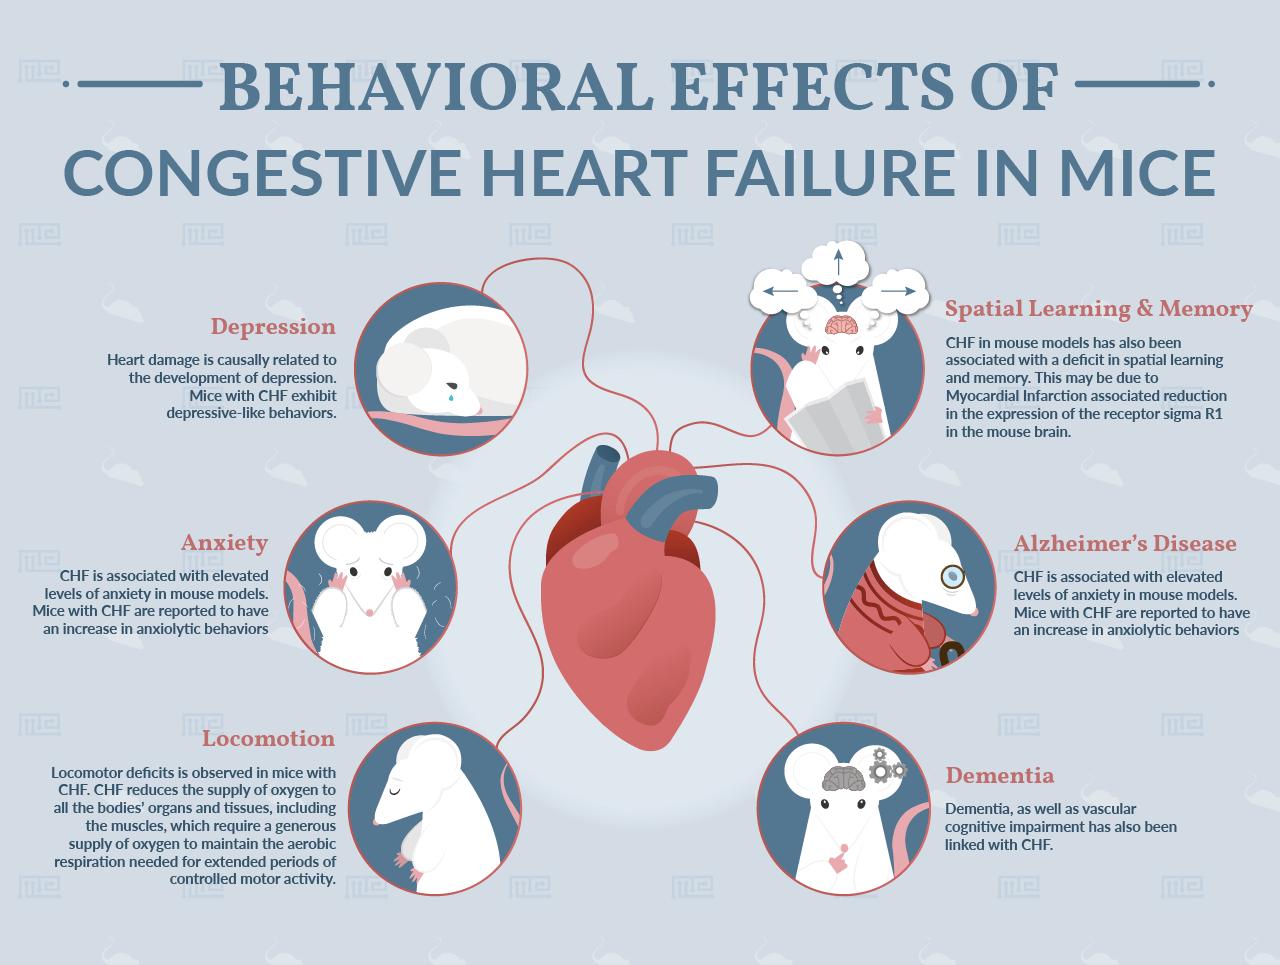 Congestive Heart Failure and dementia in Mice